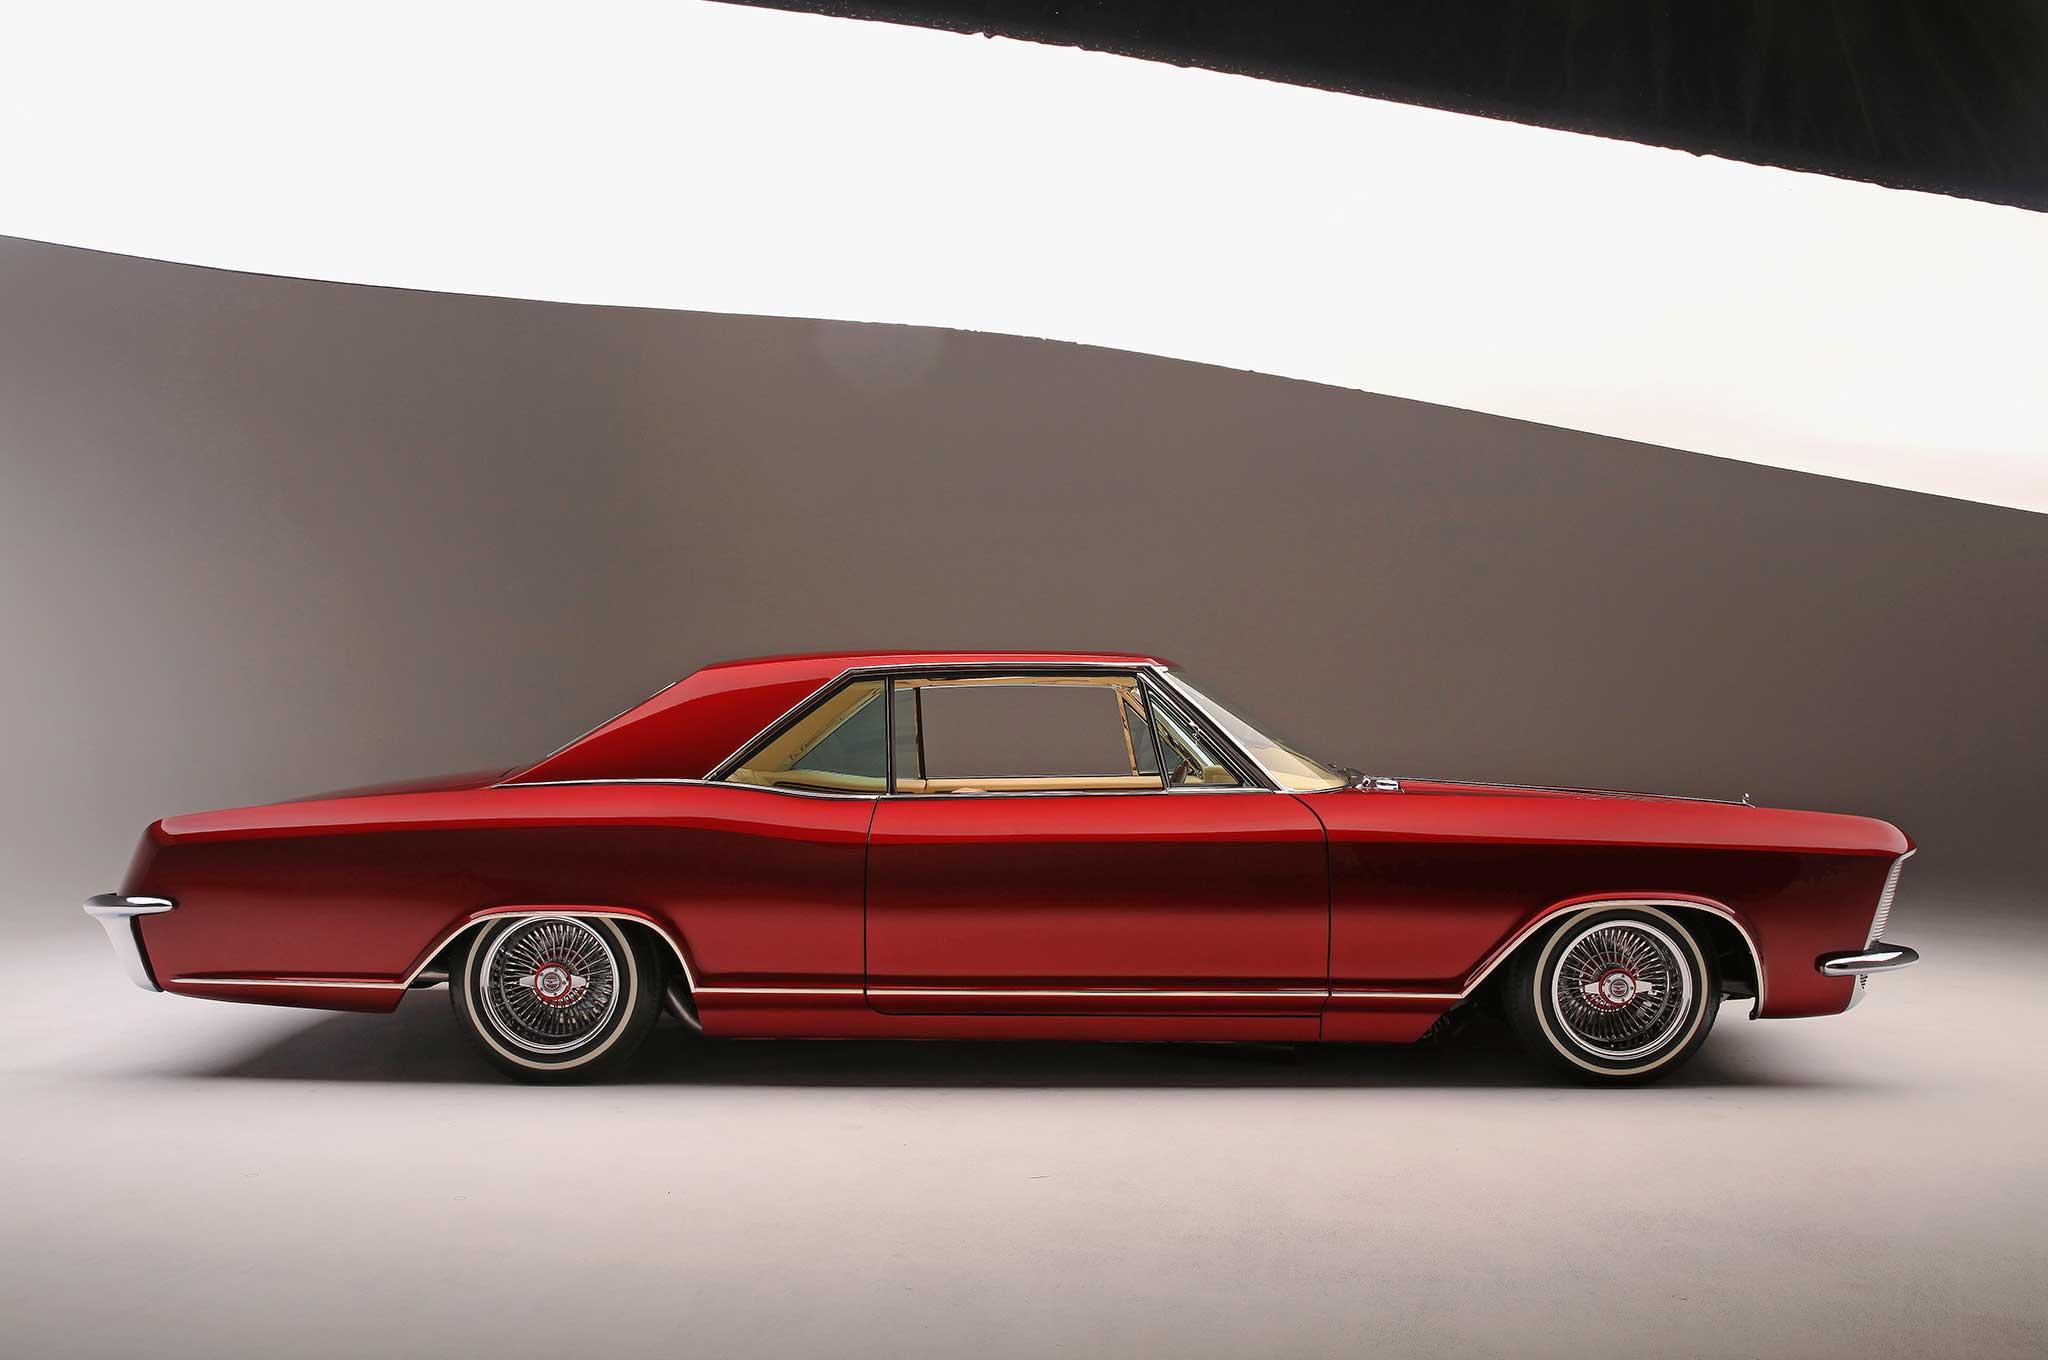 1985 Buick Regal >> Top Notch Customs Builds a Clean '65 Buick Riviera